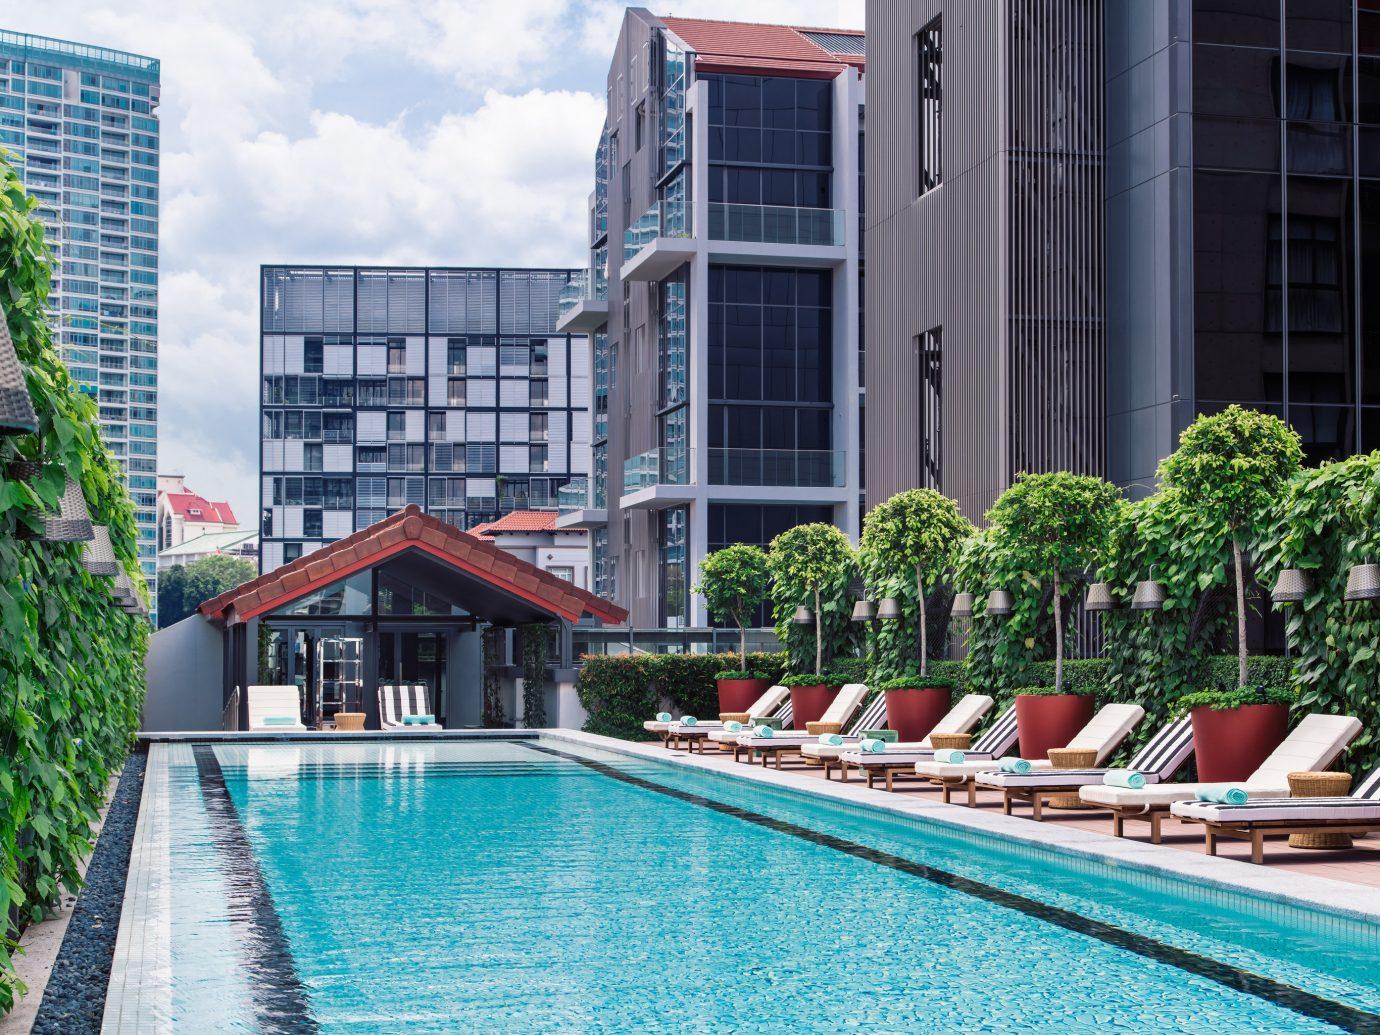 Hotels building outdoor property condominium leisure swimming pool estate vacation Resort backyard apartment waterway